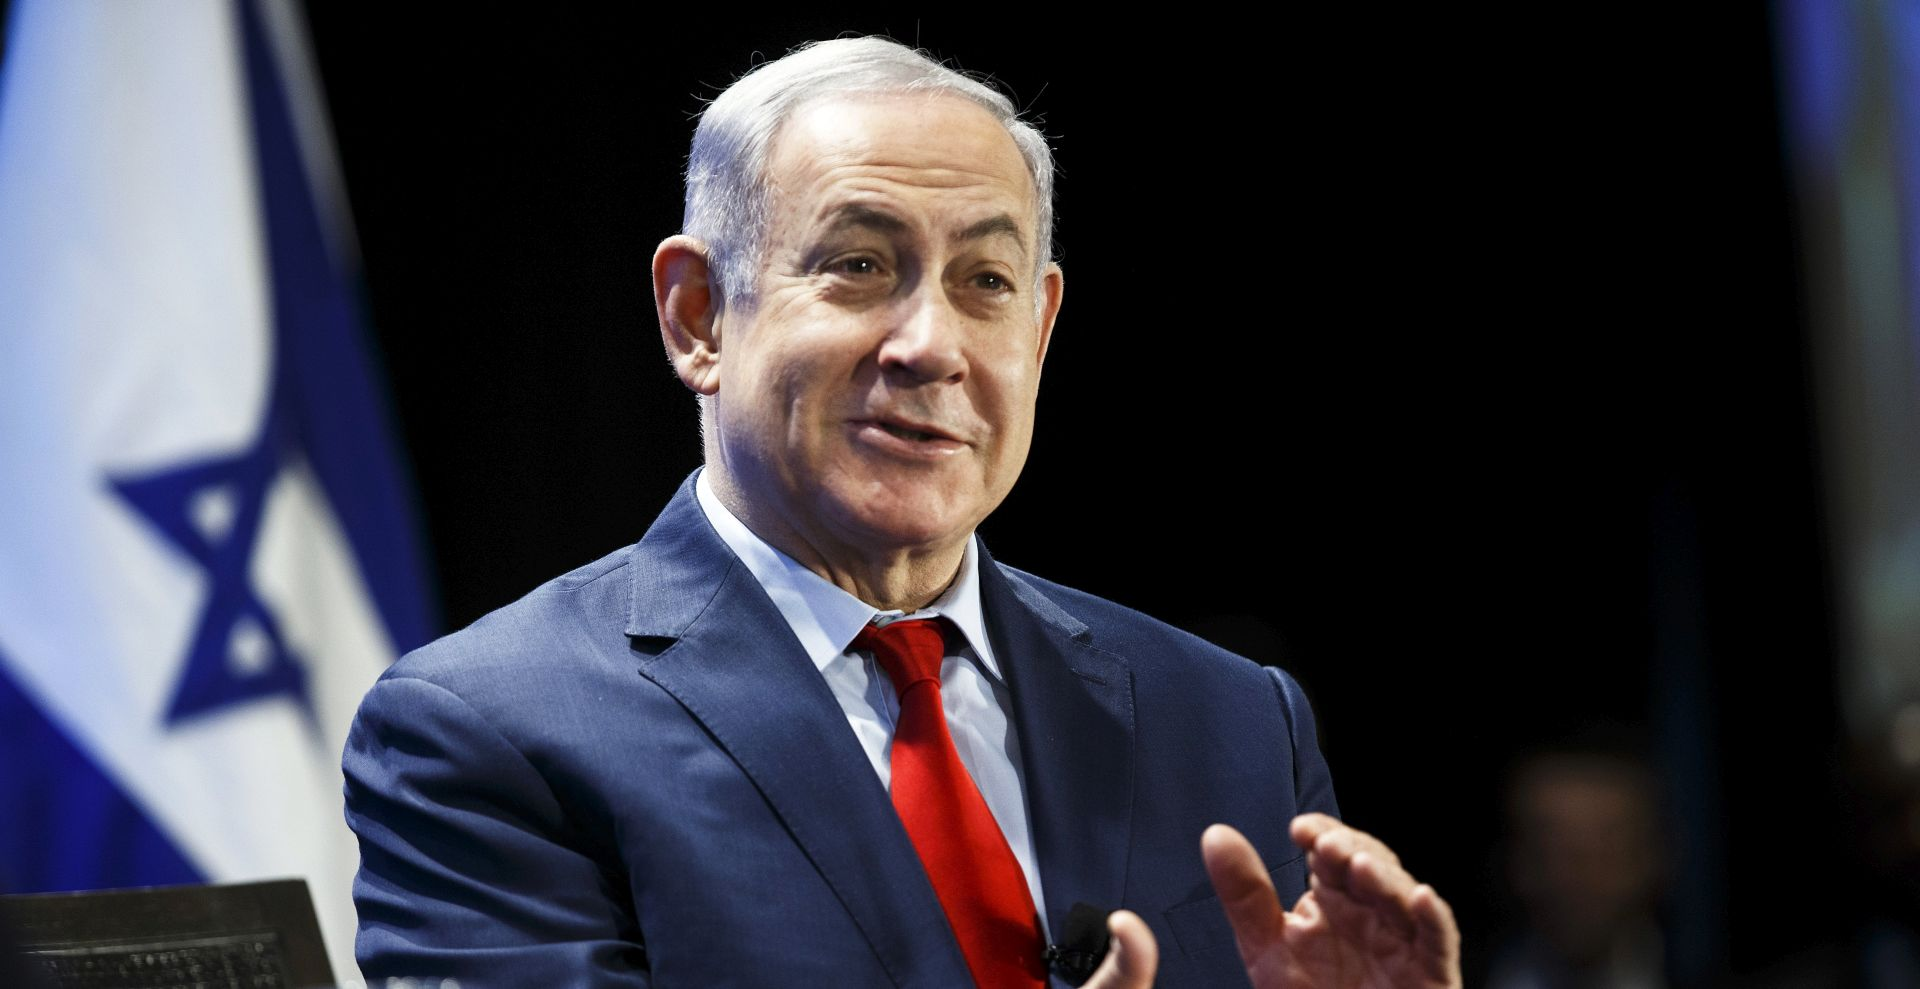 Netanyahu u Berlinu, glavna tema Iran